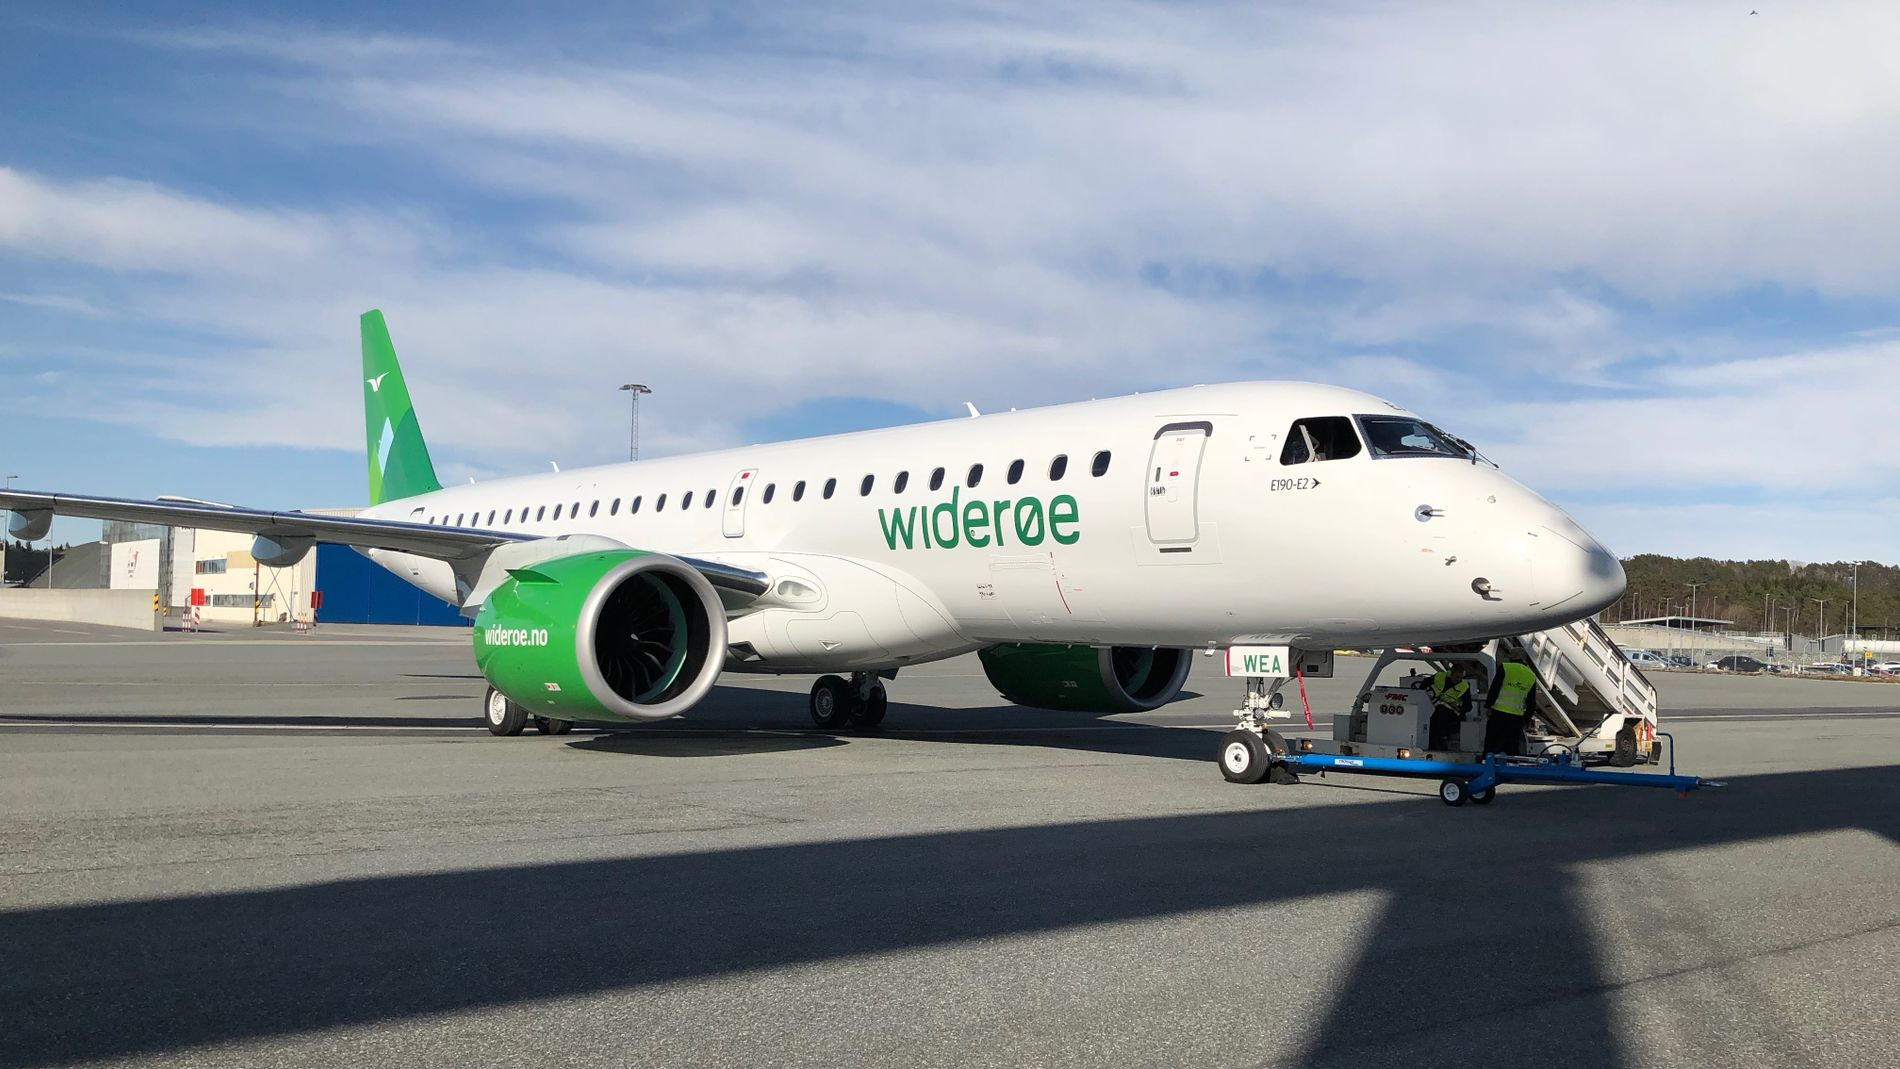 Widerøes nye og moderne regionaljetfly Embraer E2-190 lander for første gang på norsk jord på Flesland 12. april 2018. Selskapet har totalt tre fly i flåten, og opsjoner på flere fly.